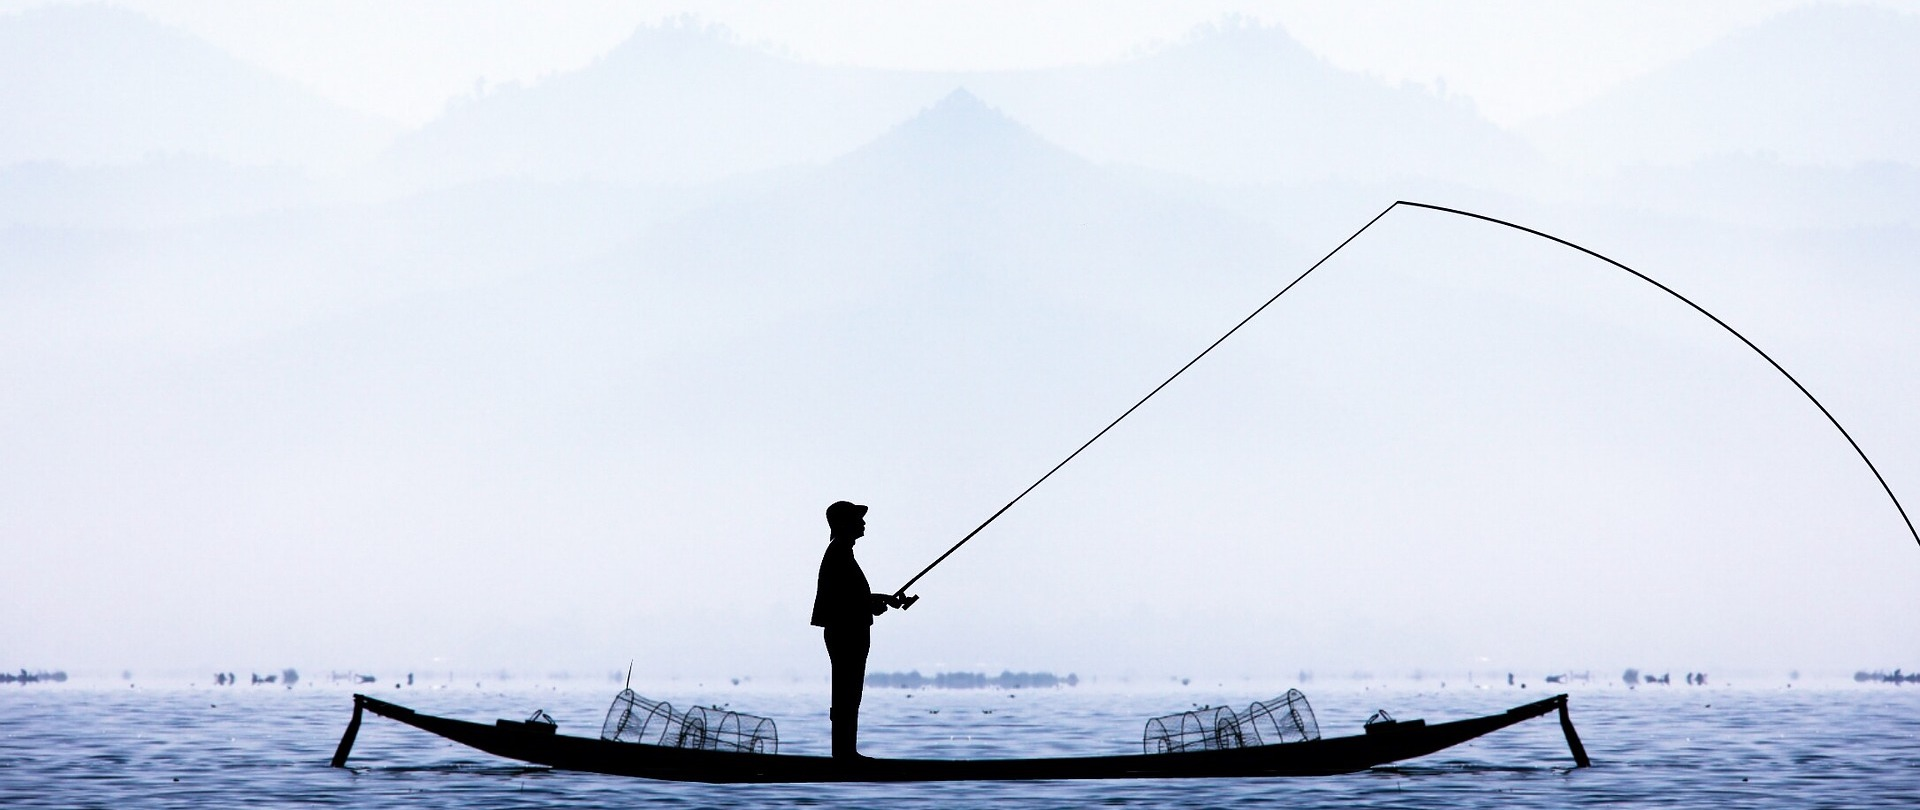 Fisherman 3139703 1920